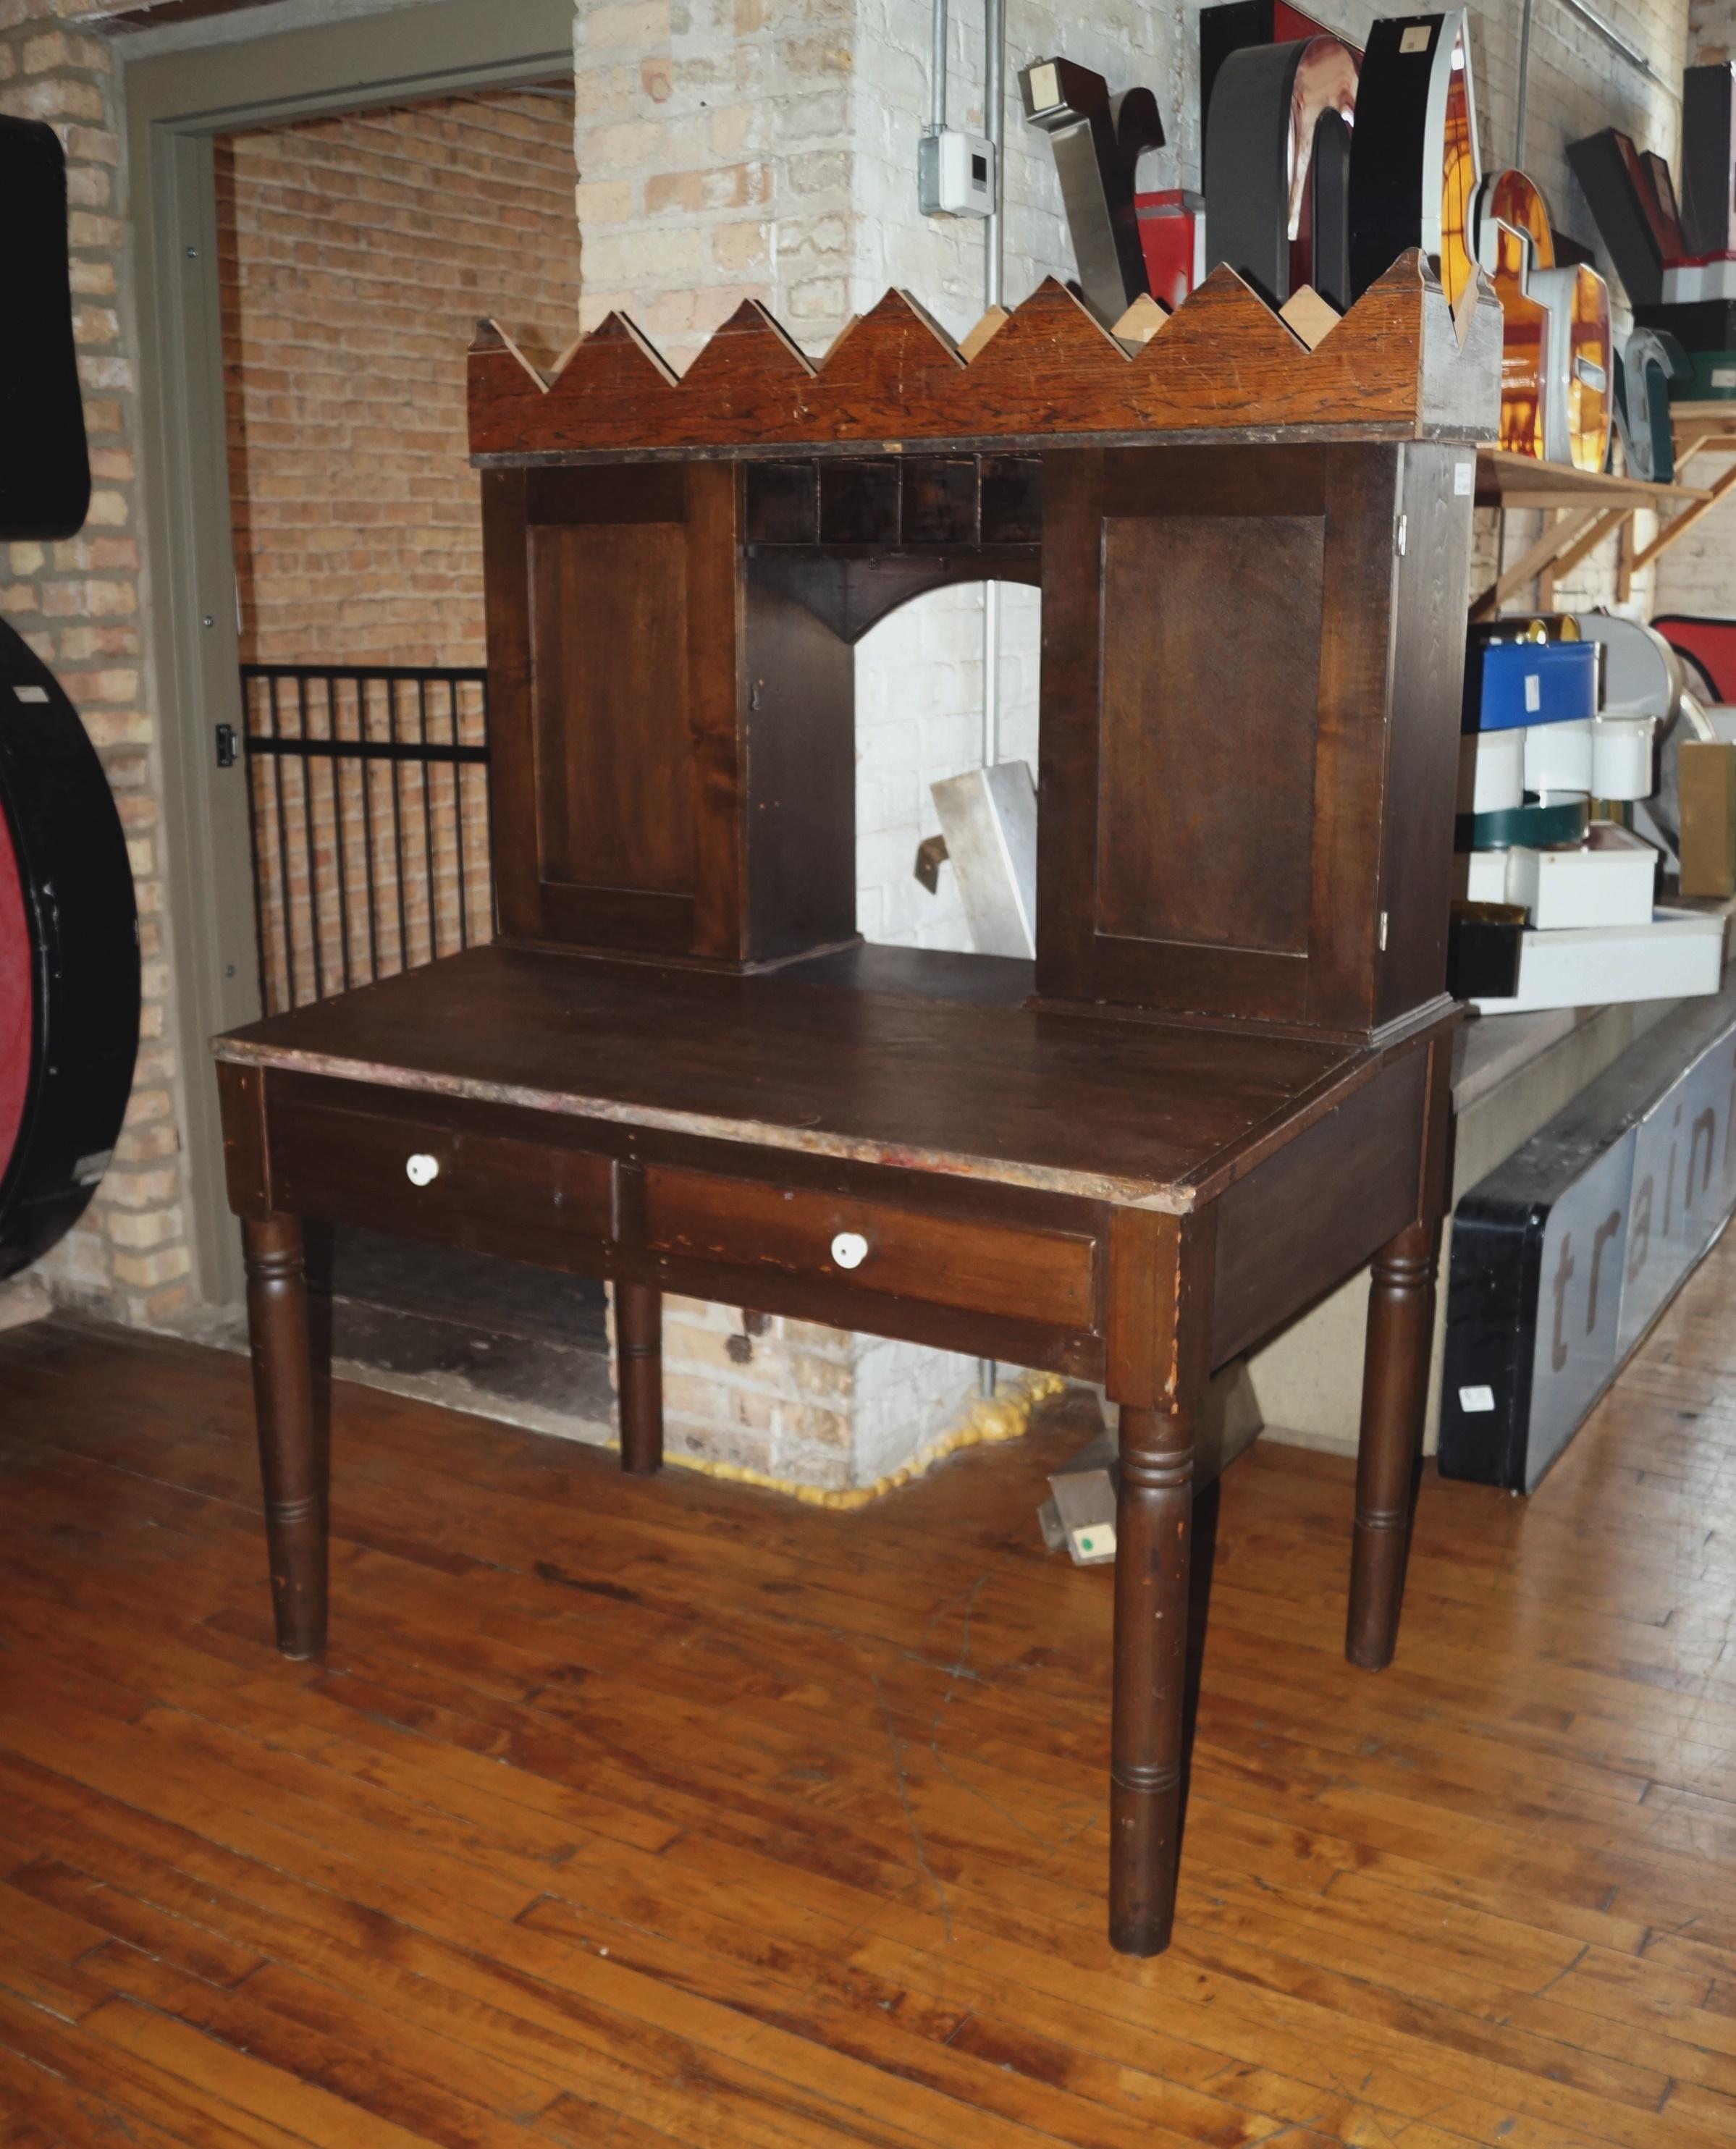 Antique Furniture Supplies Mail: Antique Wood Writing Mail Desk W Cubbies